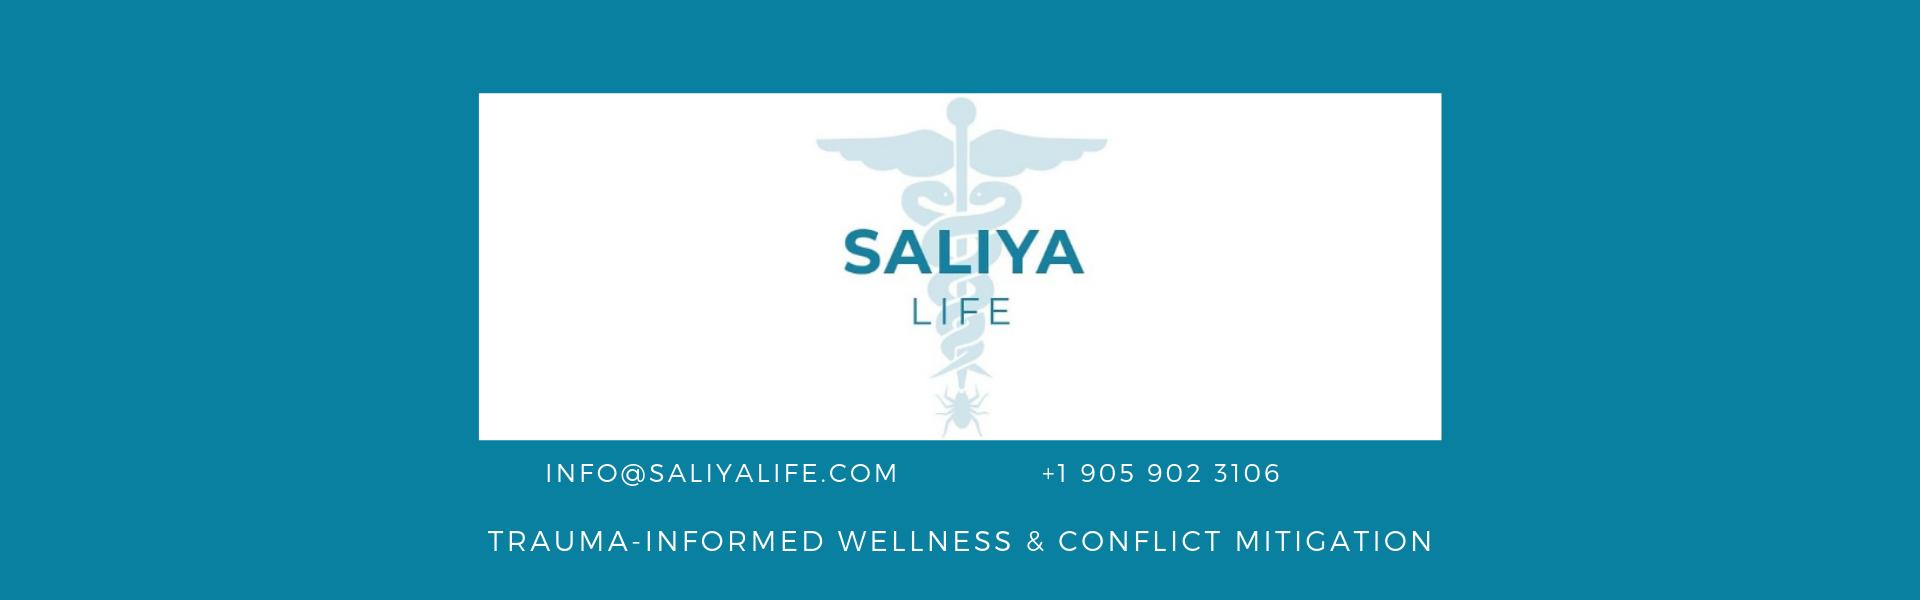 saliya-trauma-informed-wellness-conflict-mitigation-banner